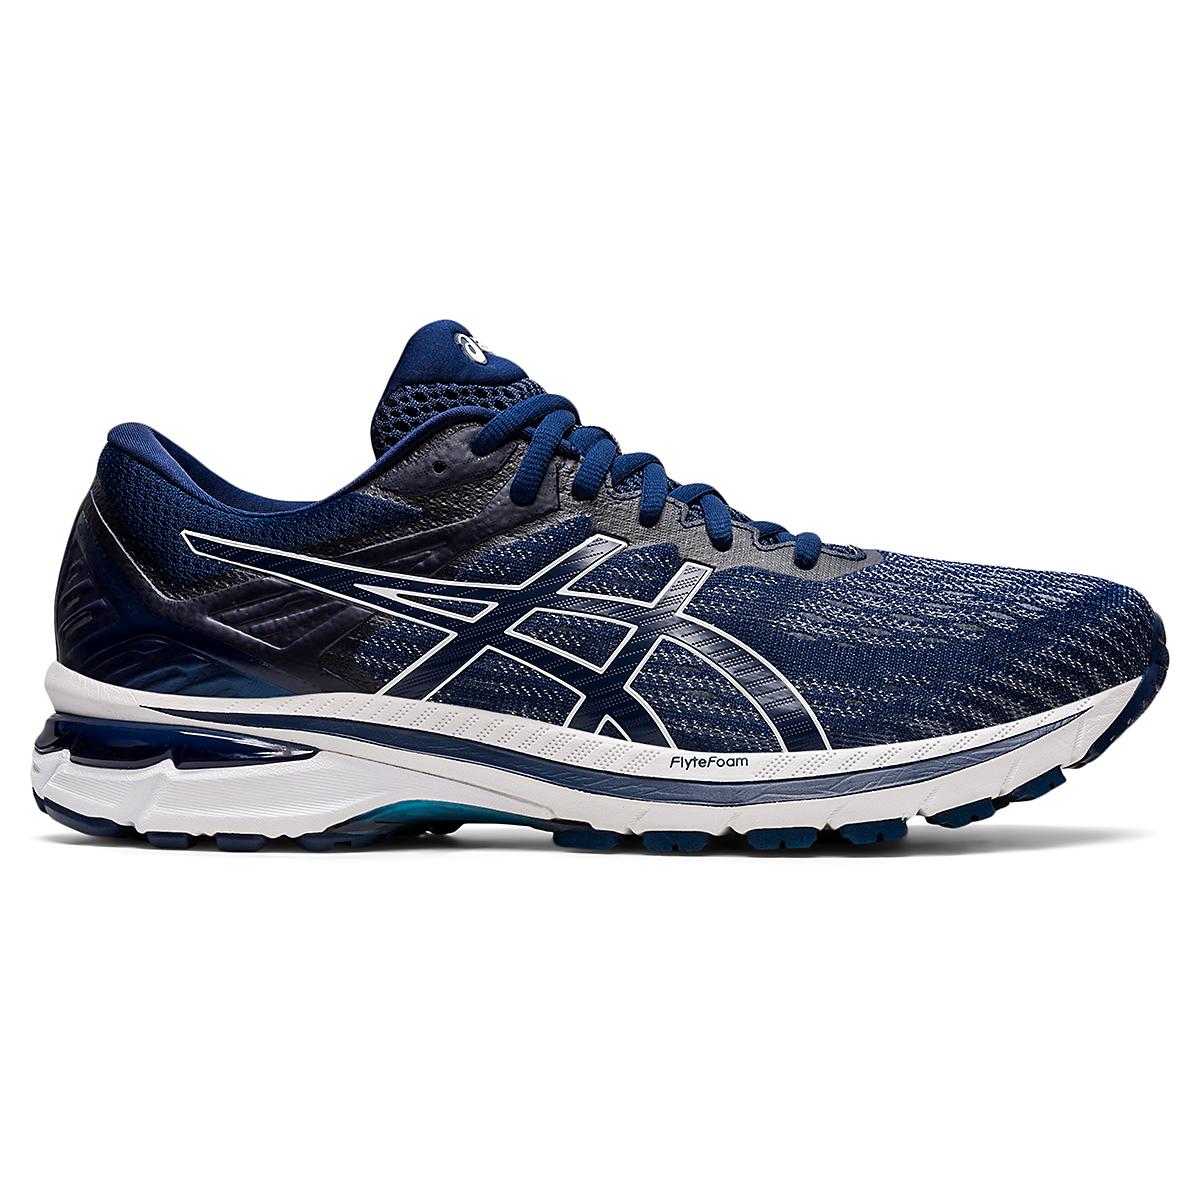 Men's Asics GT-2000 9 Running Shoe - Color: Blue Expanse - Size: 6 - Width: Regular, Blue Expanse, large, image 1